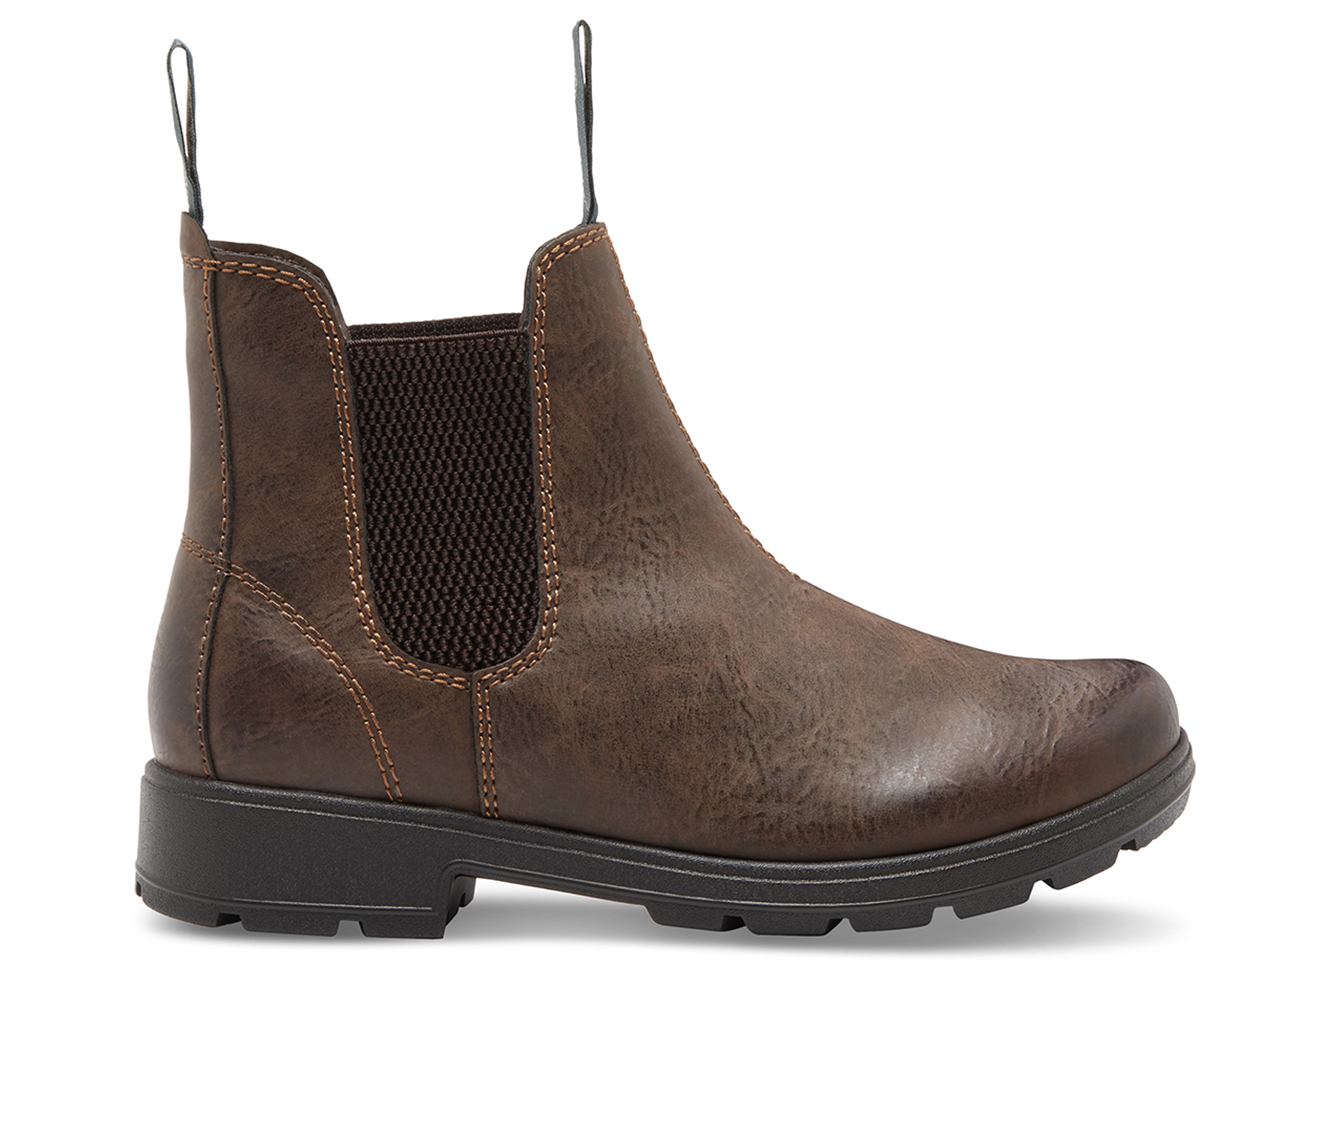 Eastland Baja Women's Boot (Brown Leather)